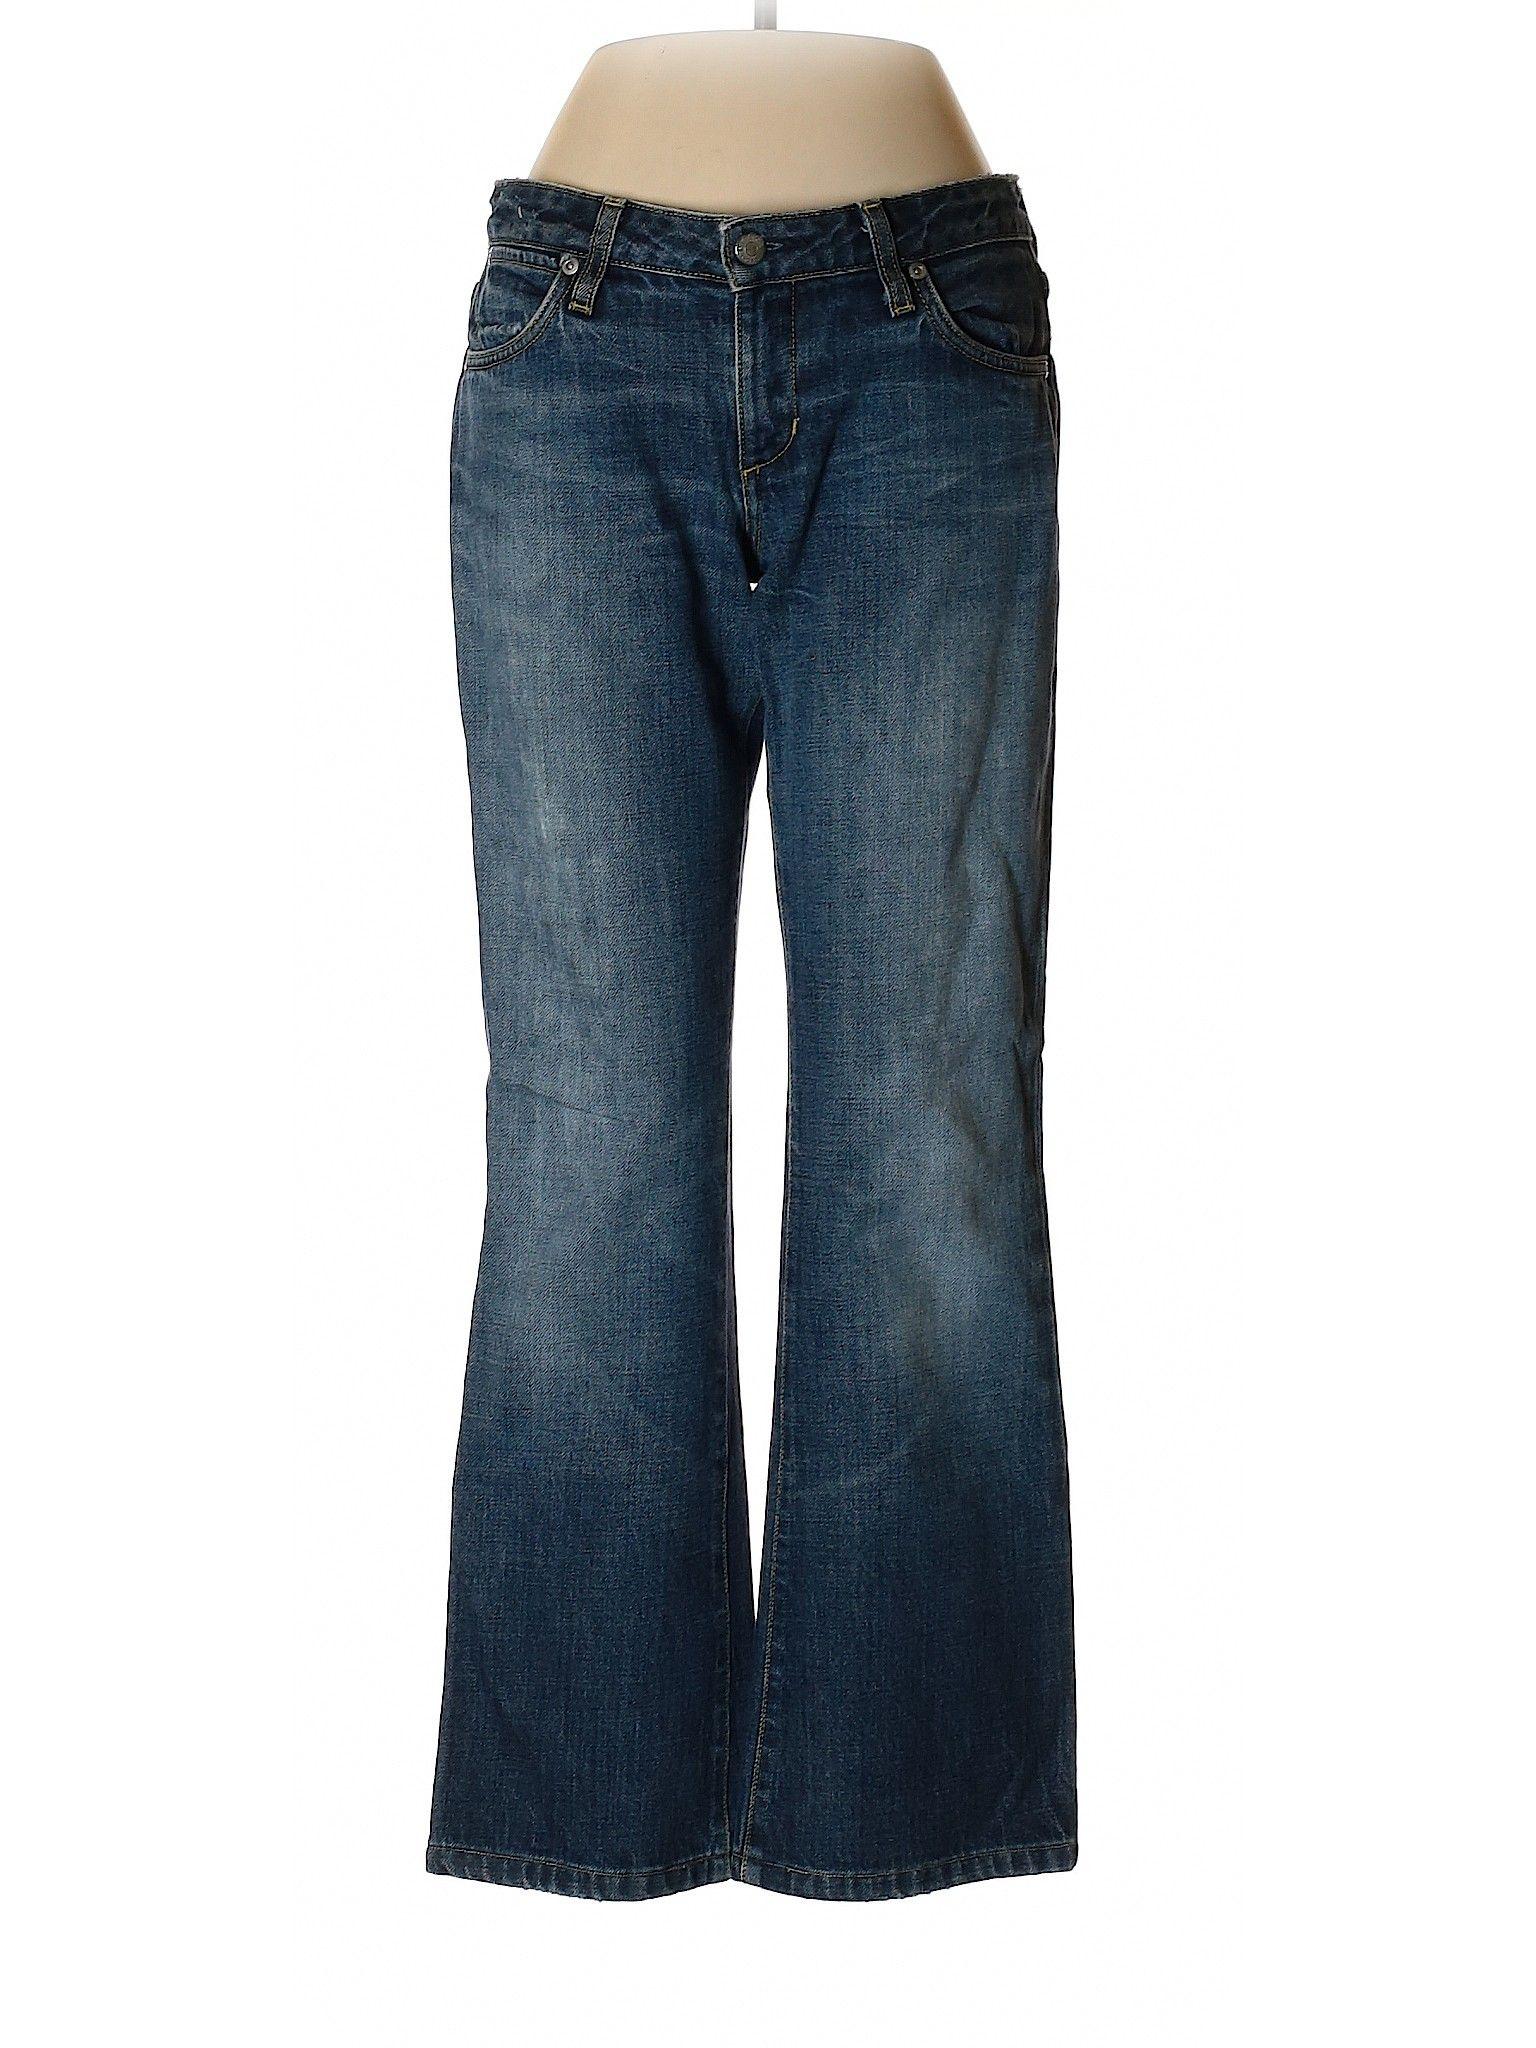 Paper Denim Cloth Jeans Low Rise Blue Bottoms Size 25 Second Hand Clothes Womens Jeans Bootcut Clothes